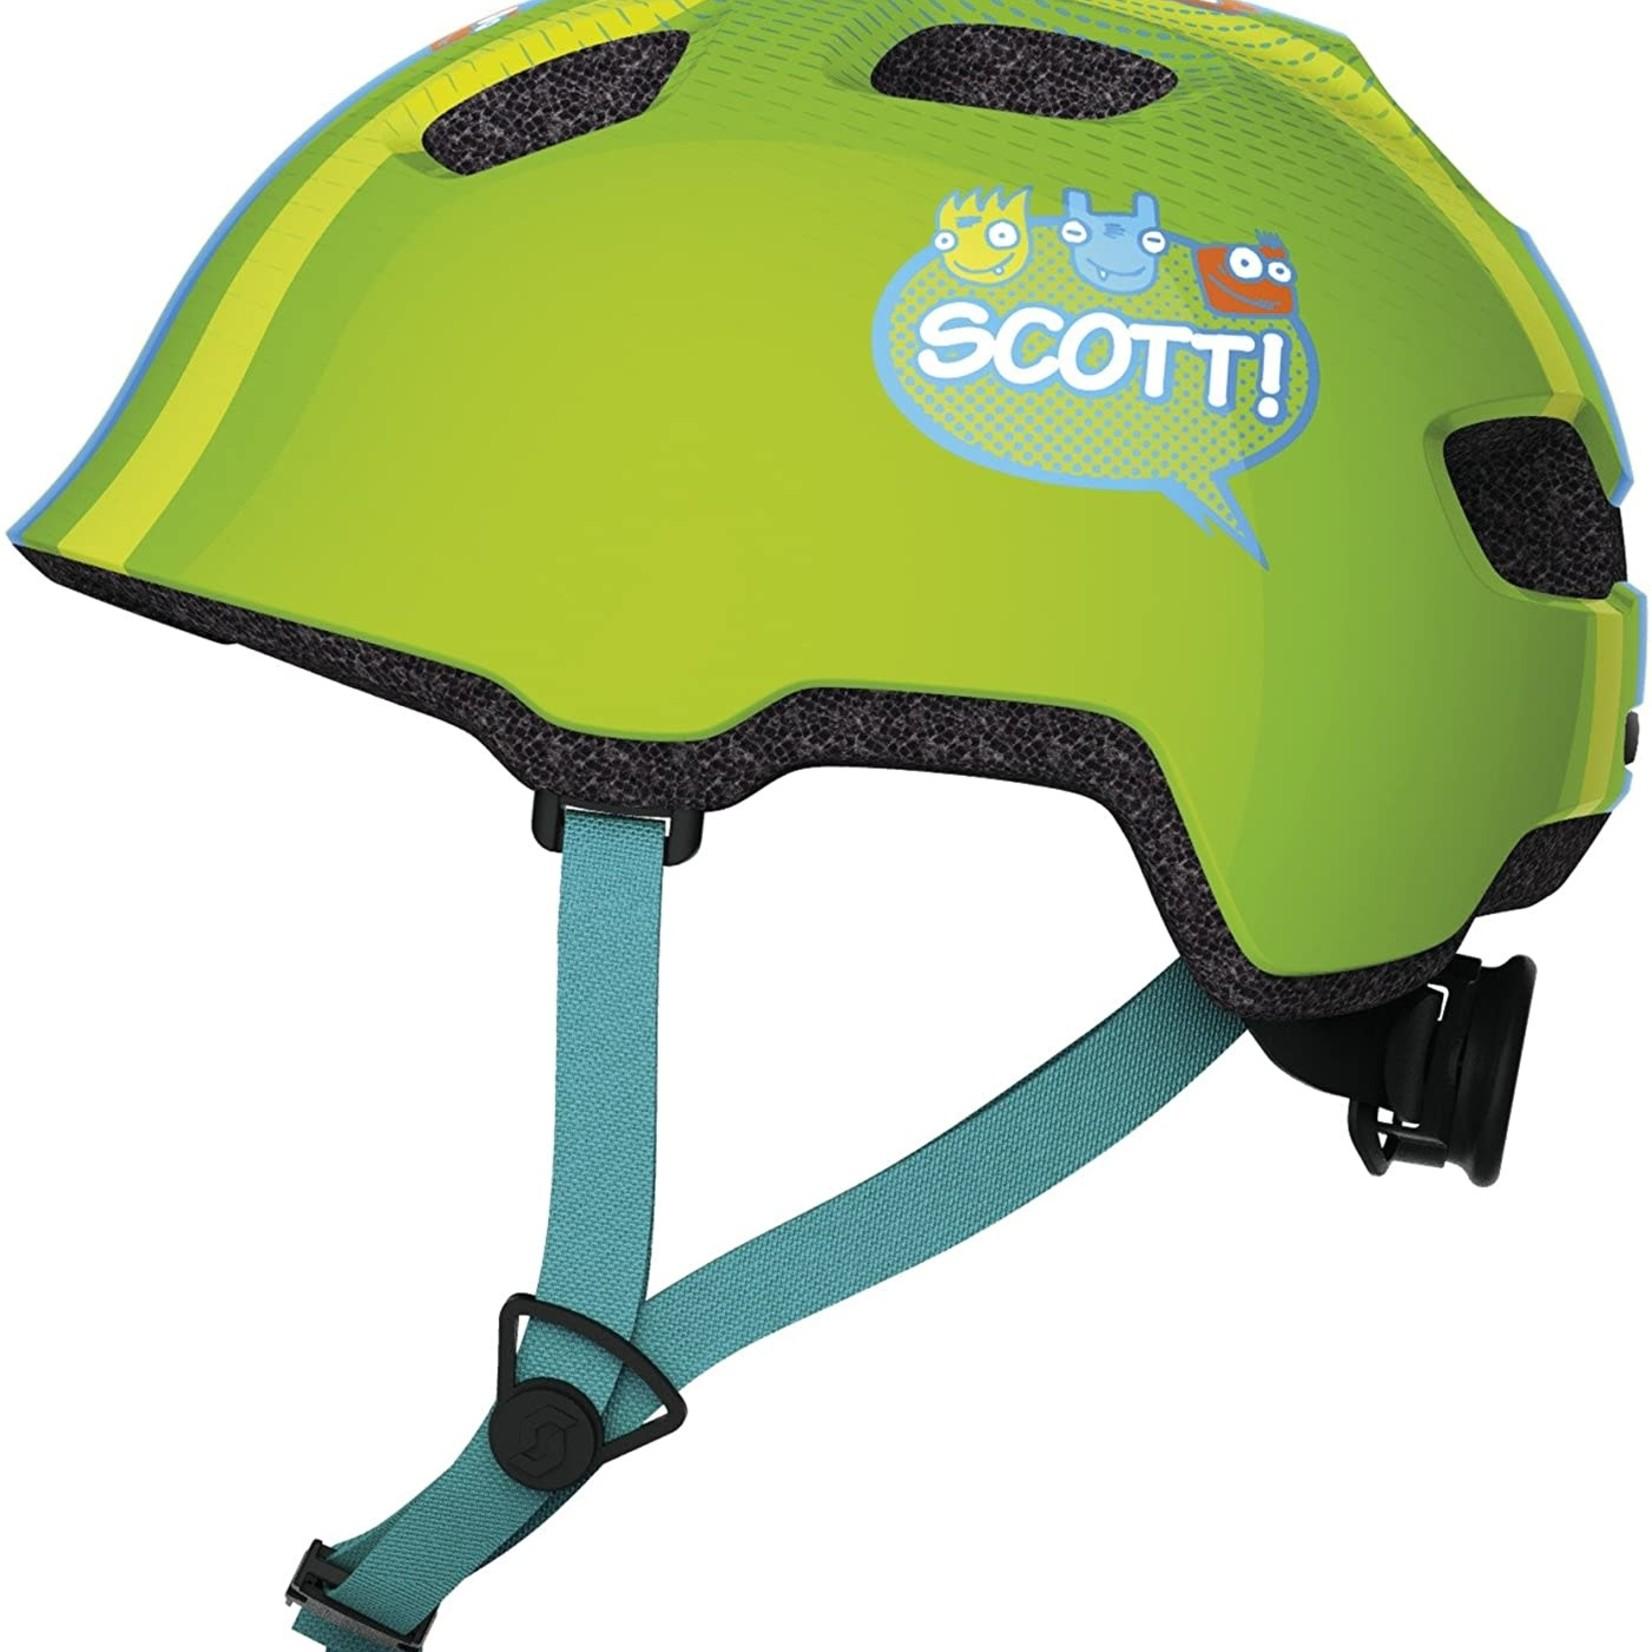 Scott Sports Helmet Chomp (CPSC) green stripe 1size